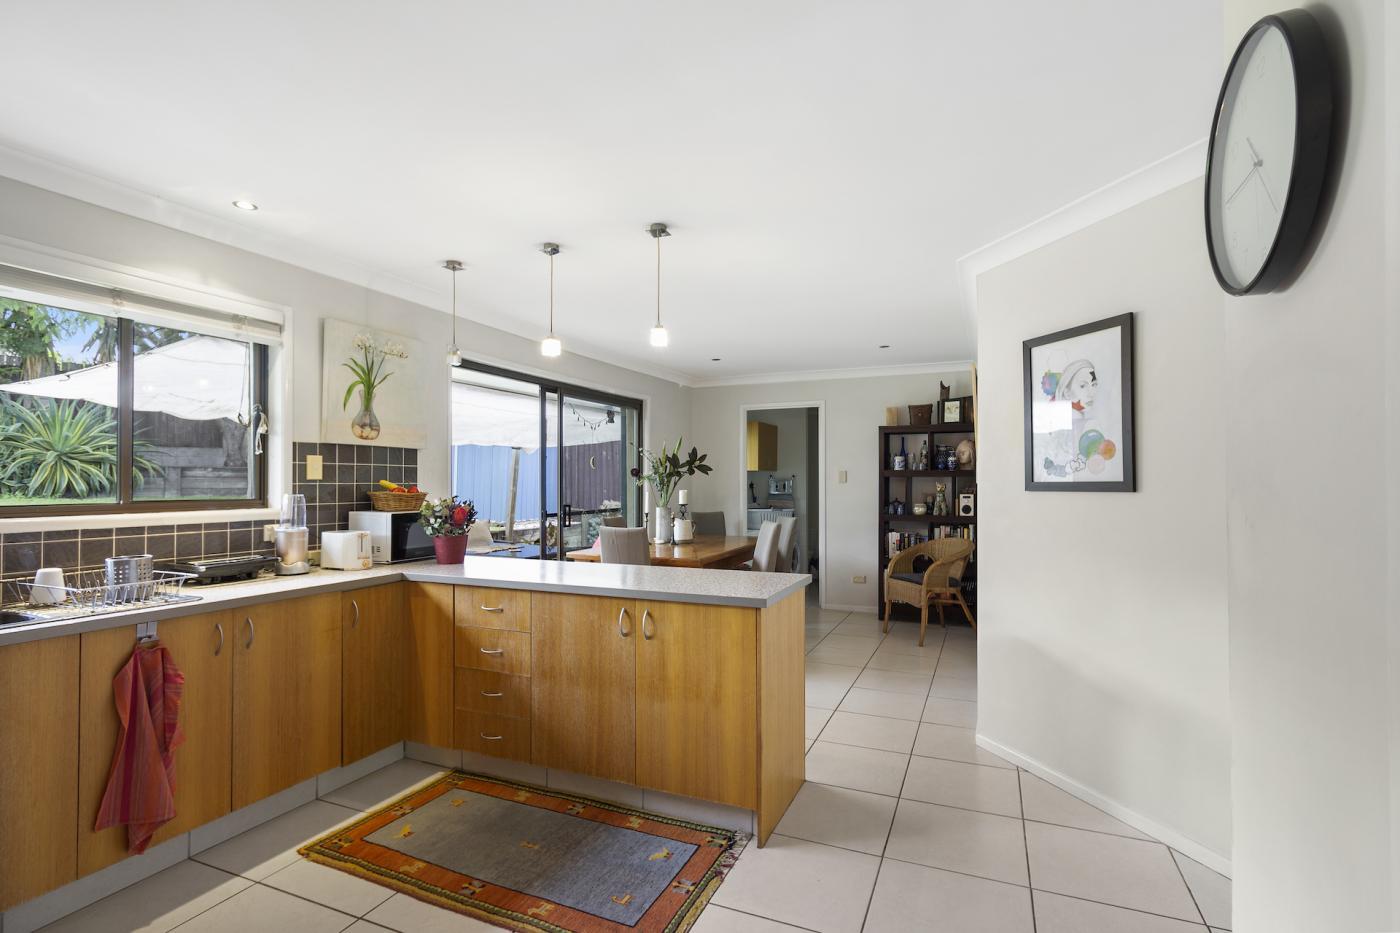 M-Motion Real Estate Agency, 4 Ketch Street, Jamboree Heights, Qld 4074, Amanda Blair Real Estate Agent